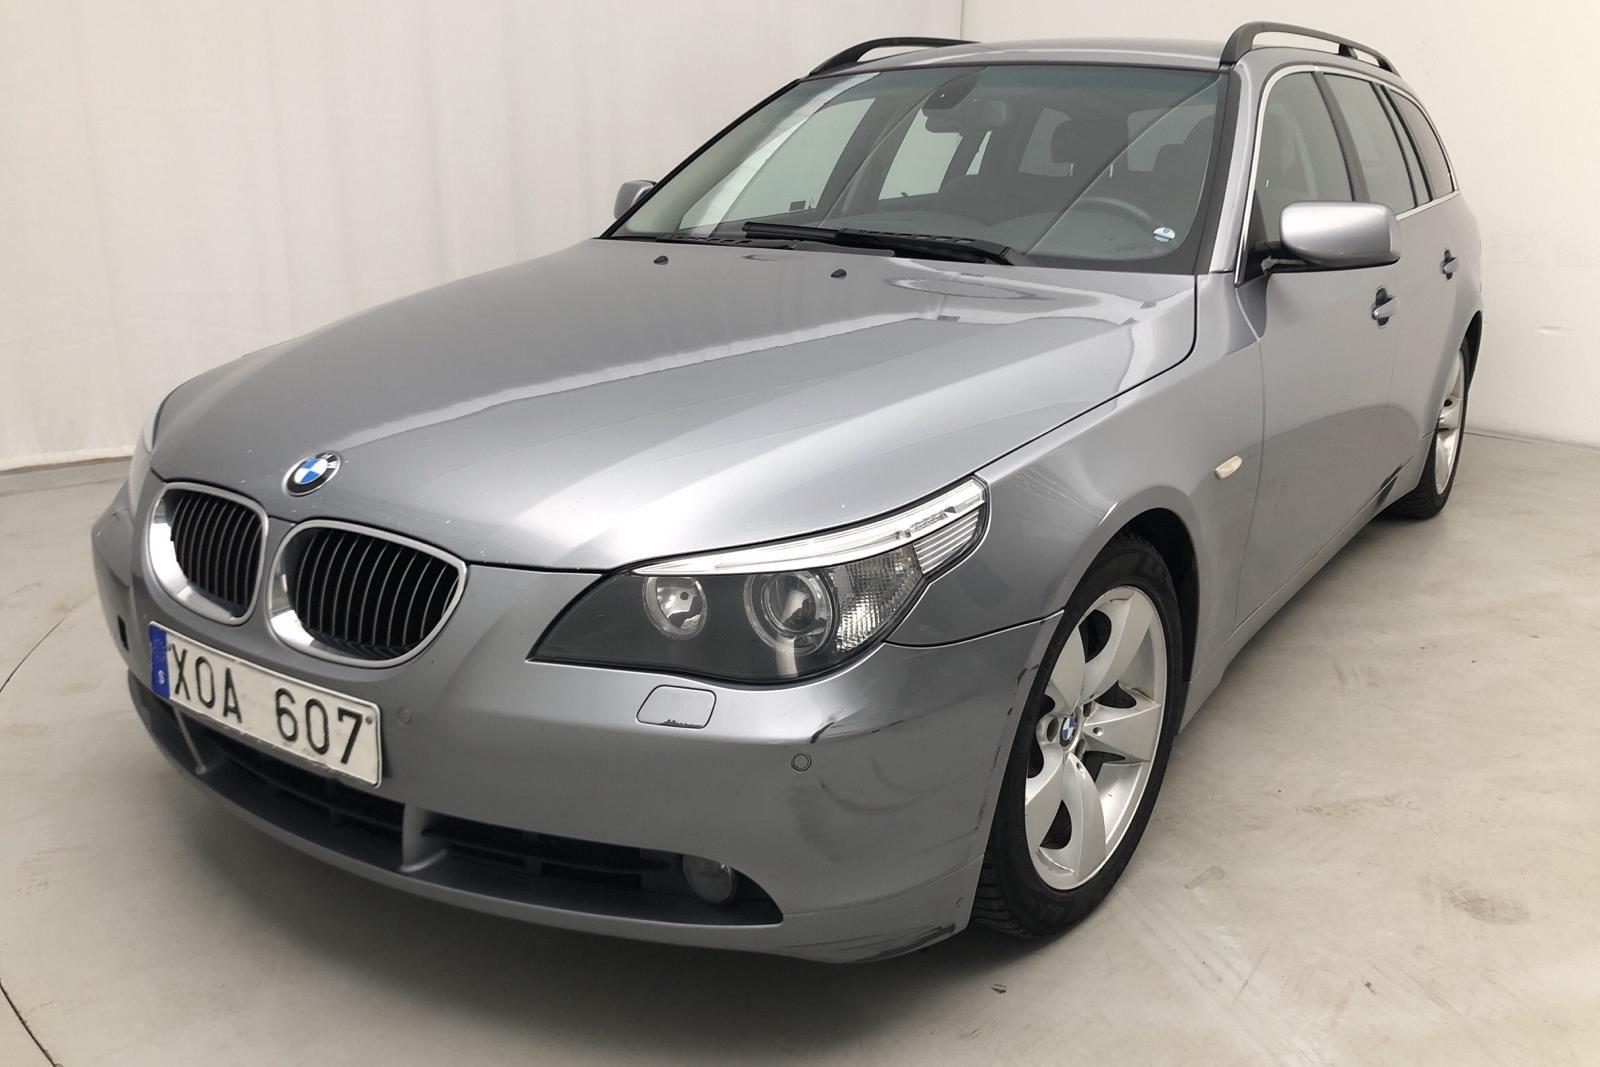 BMW 535d Touring, E61 (272hk)